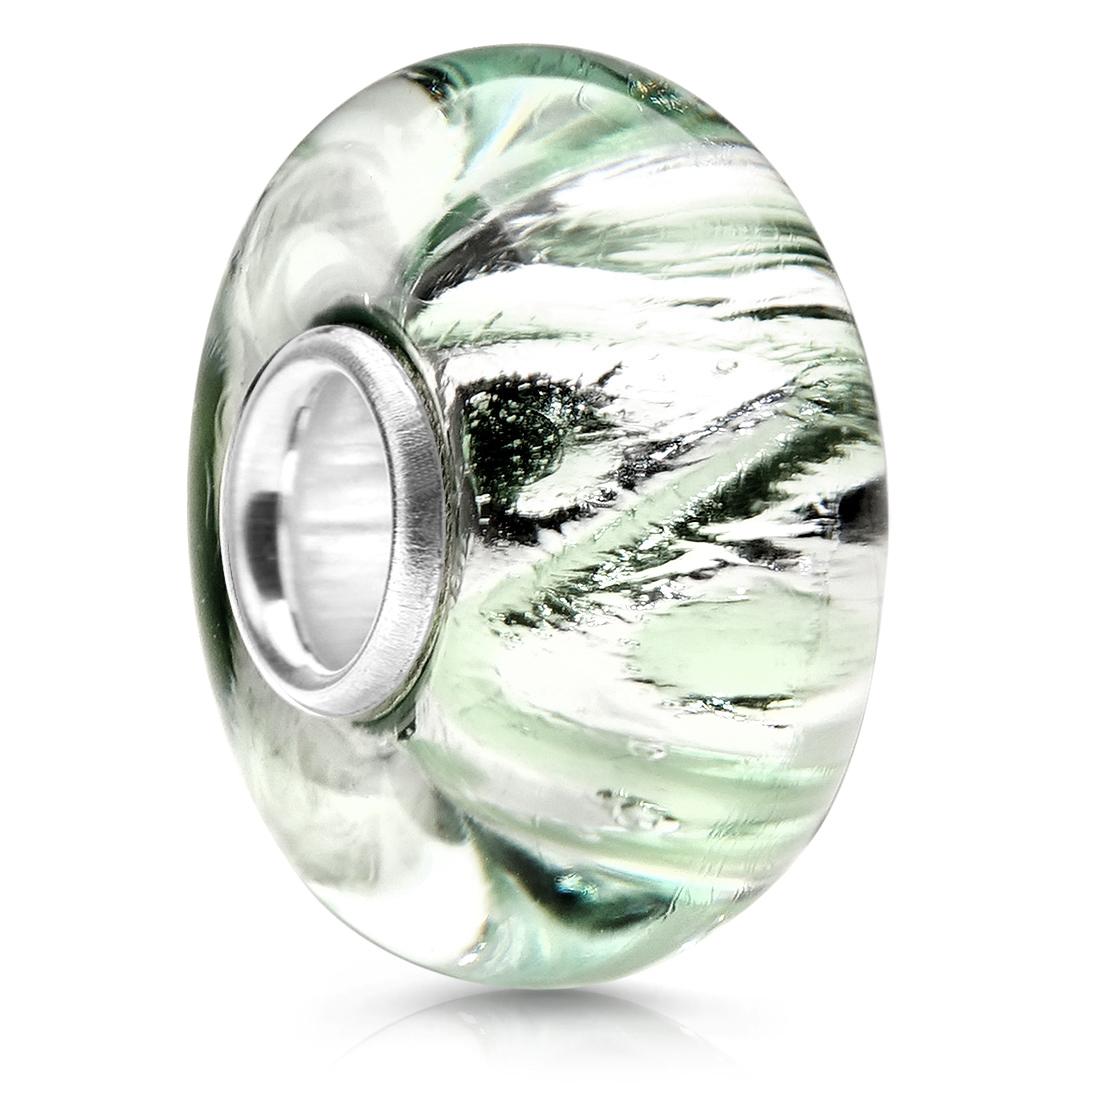 Glas Perle türkis pink MATERIA 925 Silber Beads Muranoglas Anhänger Glitzer